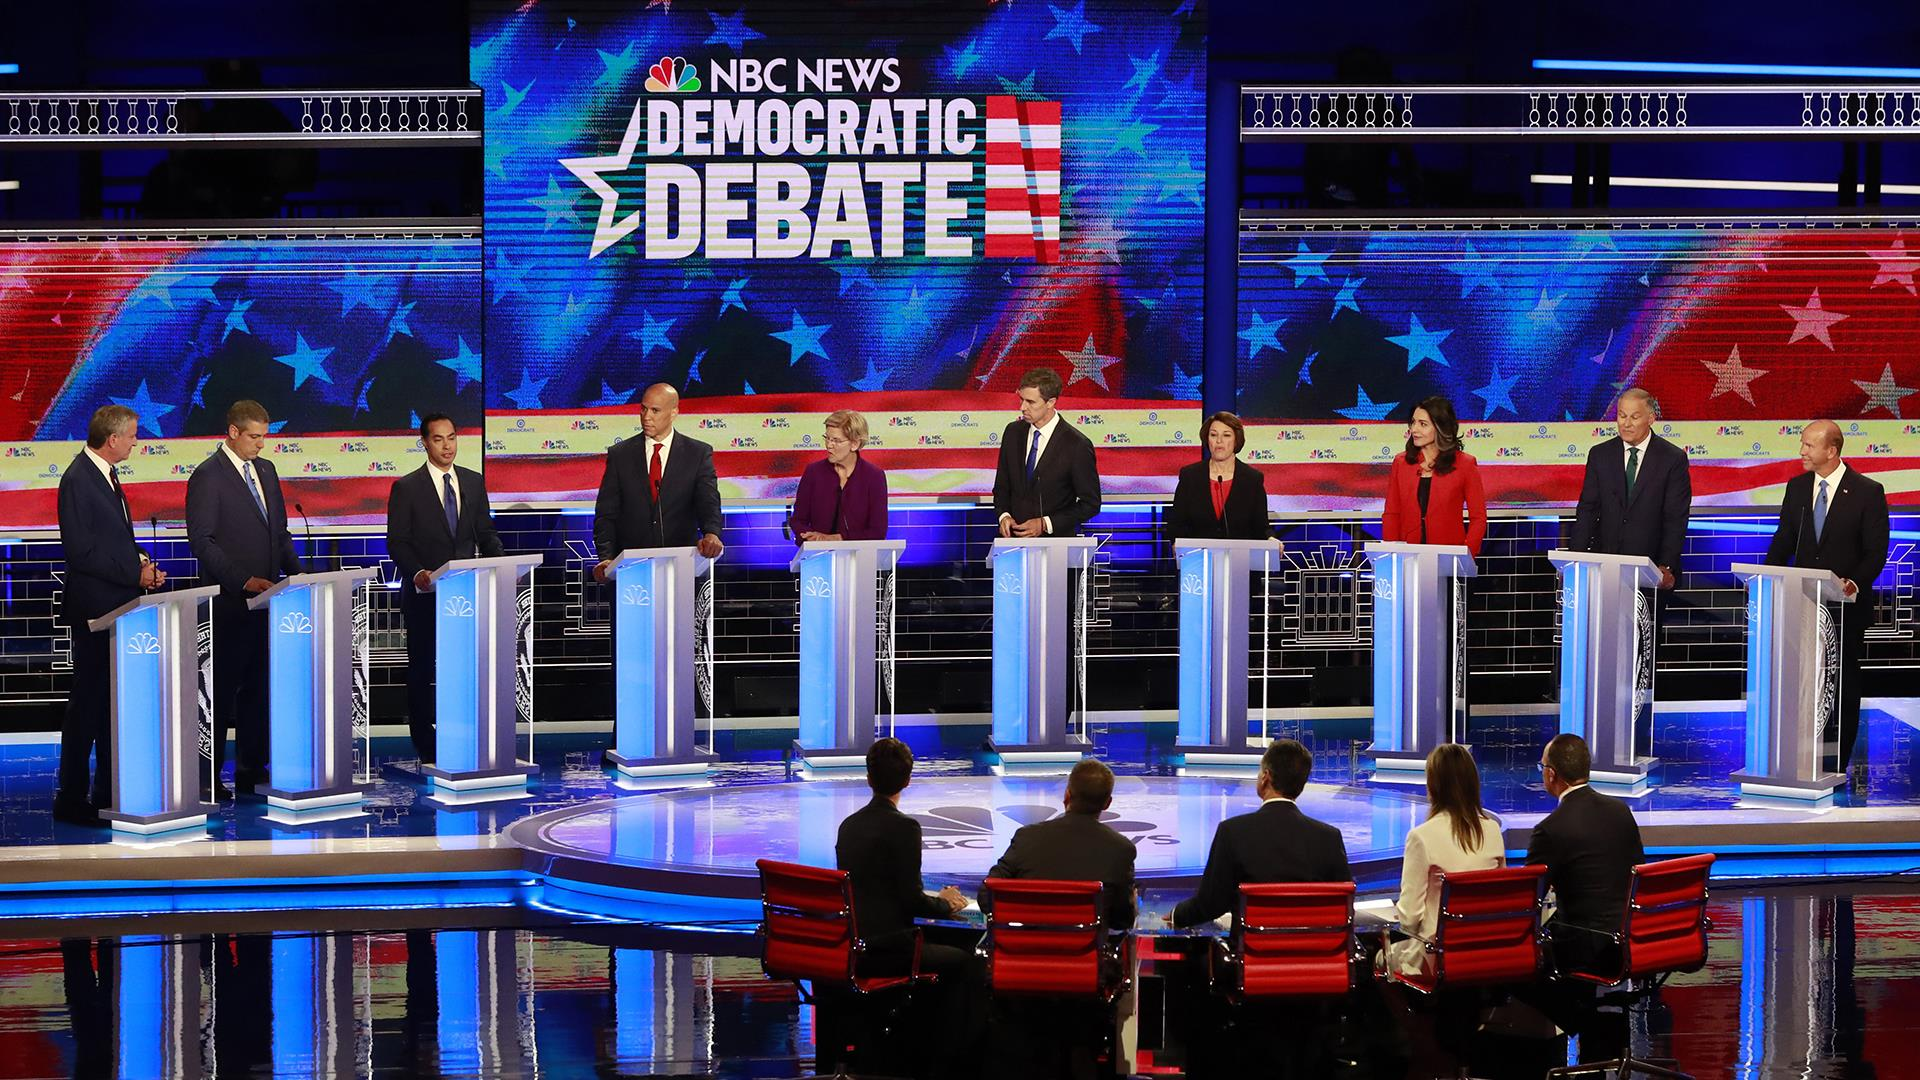 democratic debate the common good elizabeth warren cory booker beto o'rourke